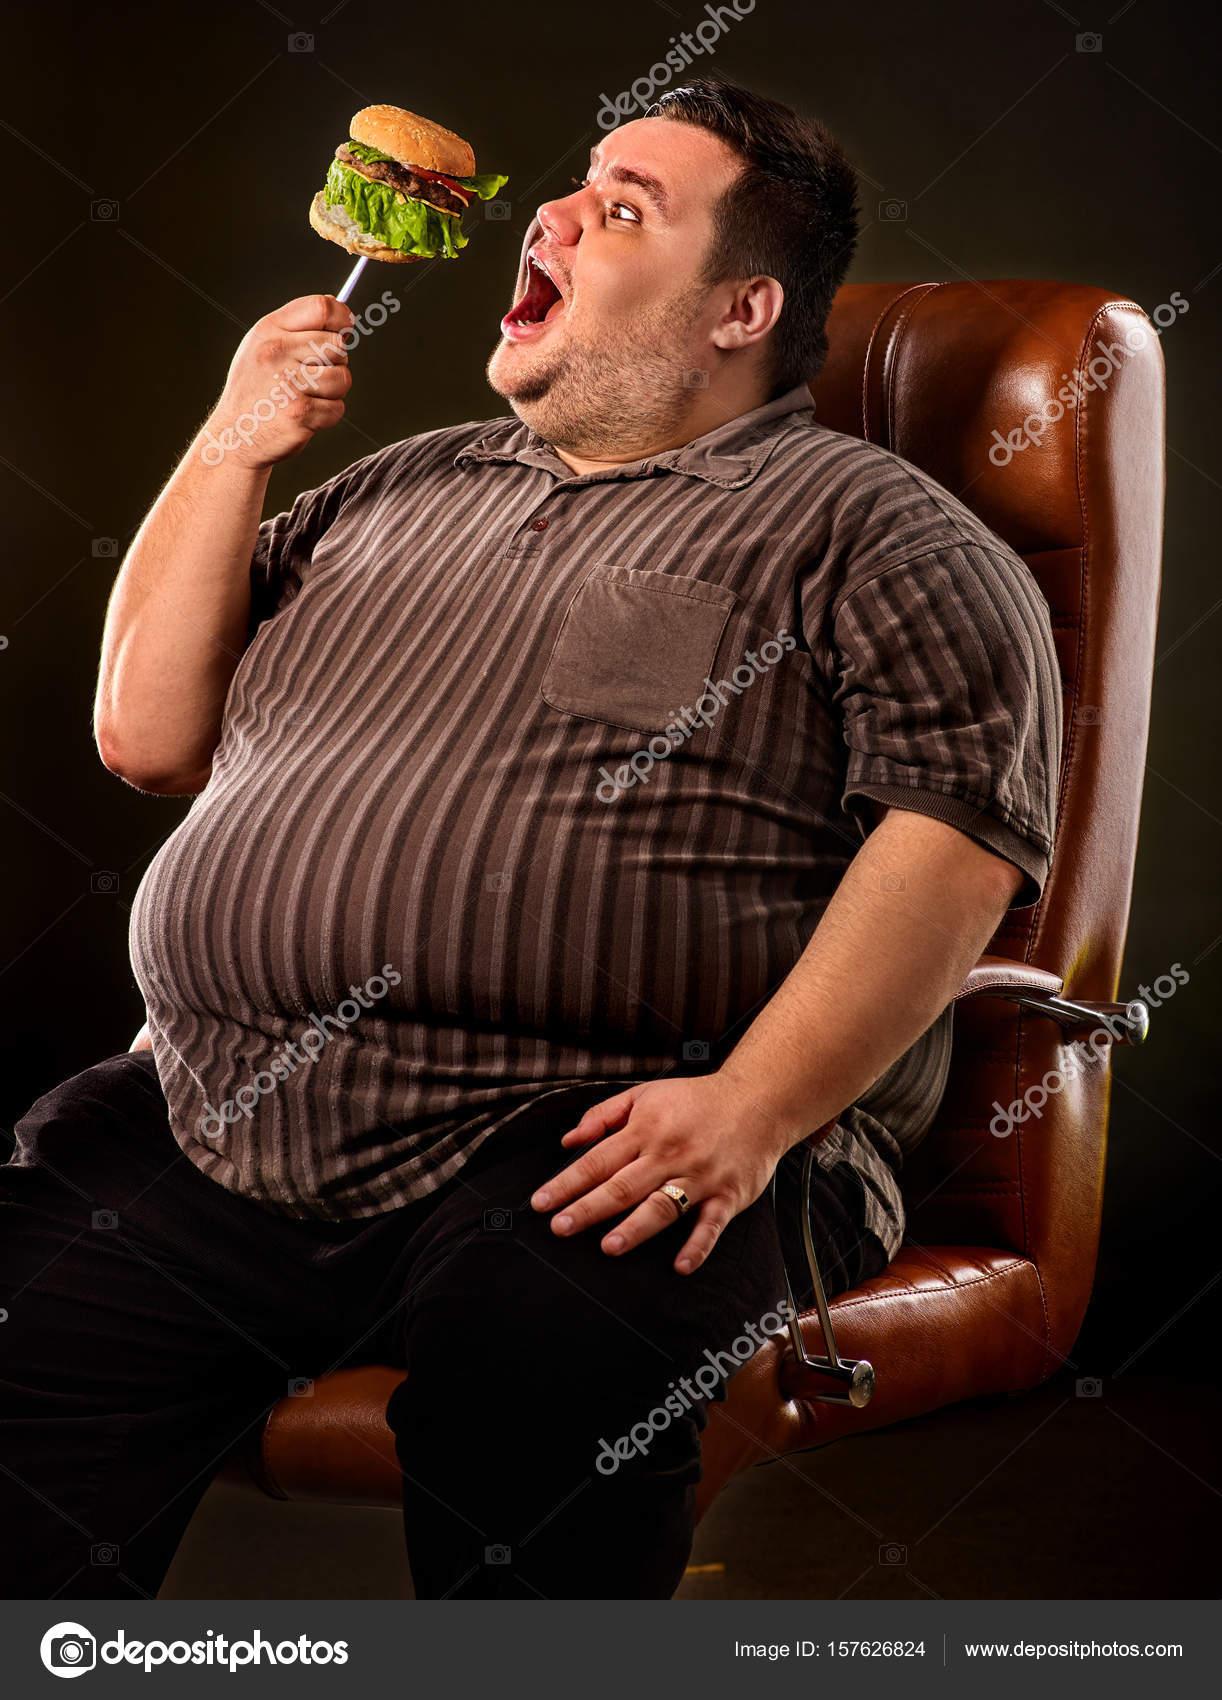 obesitas type 2